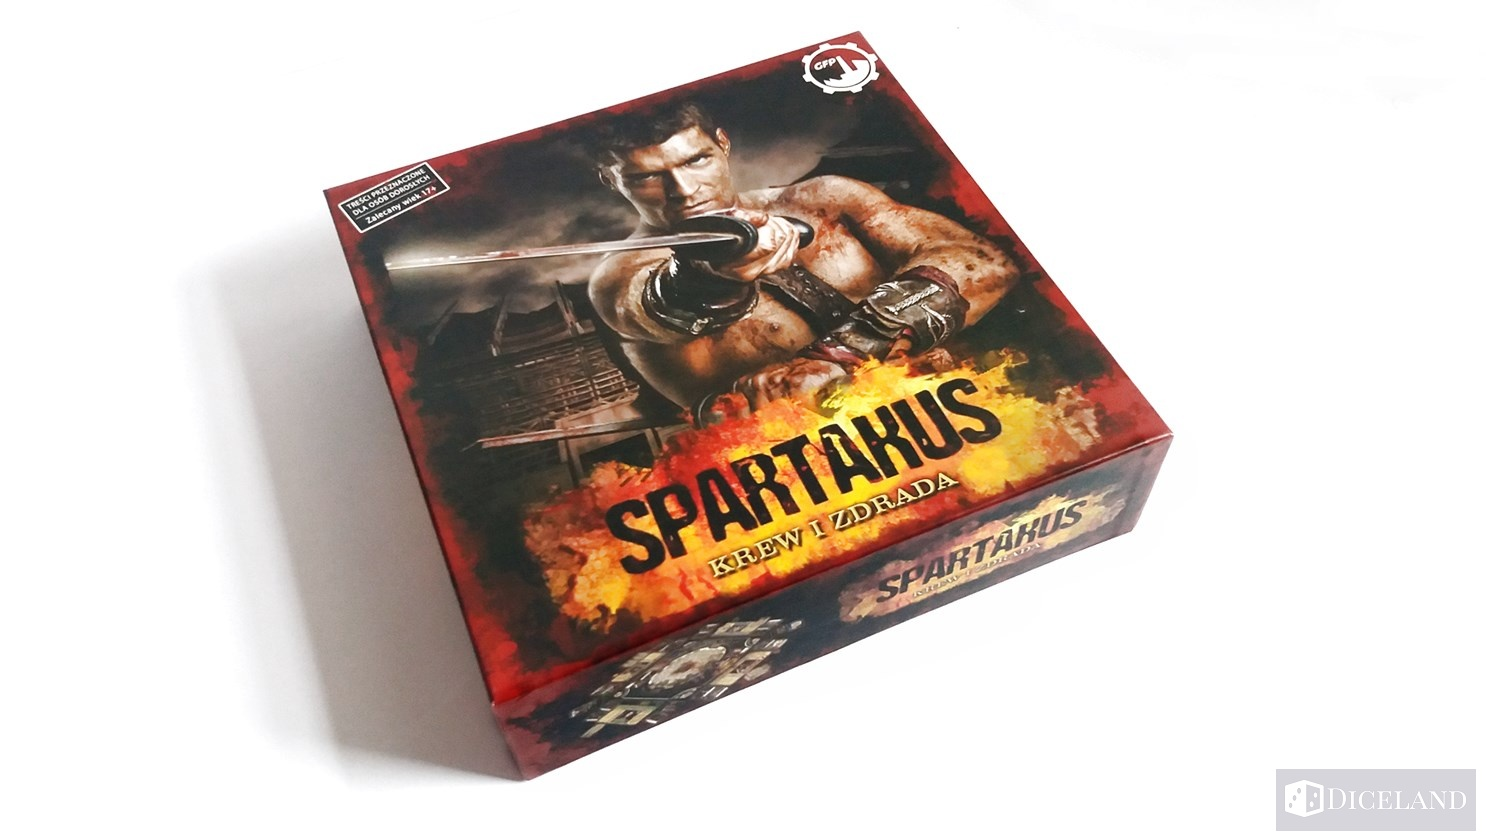 Spartakus krew i zdrada (1)